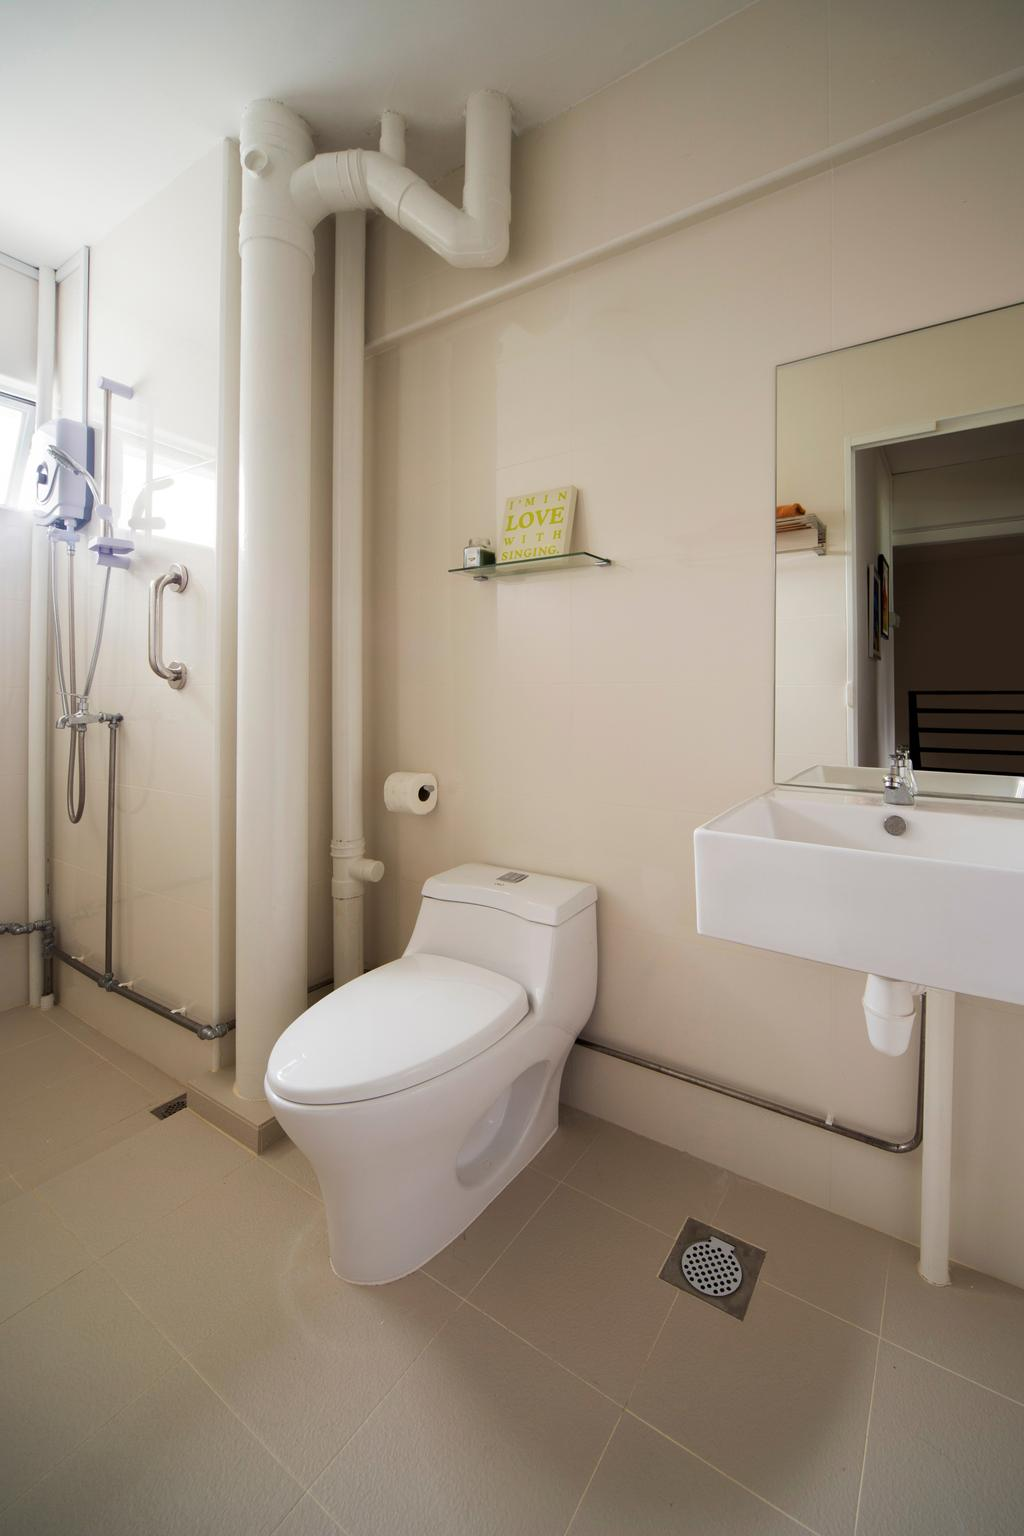 Eclectic, HDB, Bedroom, Jalan Batu Masionette, Interior Designer, Space Concepts Design, Wall Tiles, Mirror, Toilet, Molding, White Board, Shelf